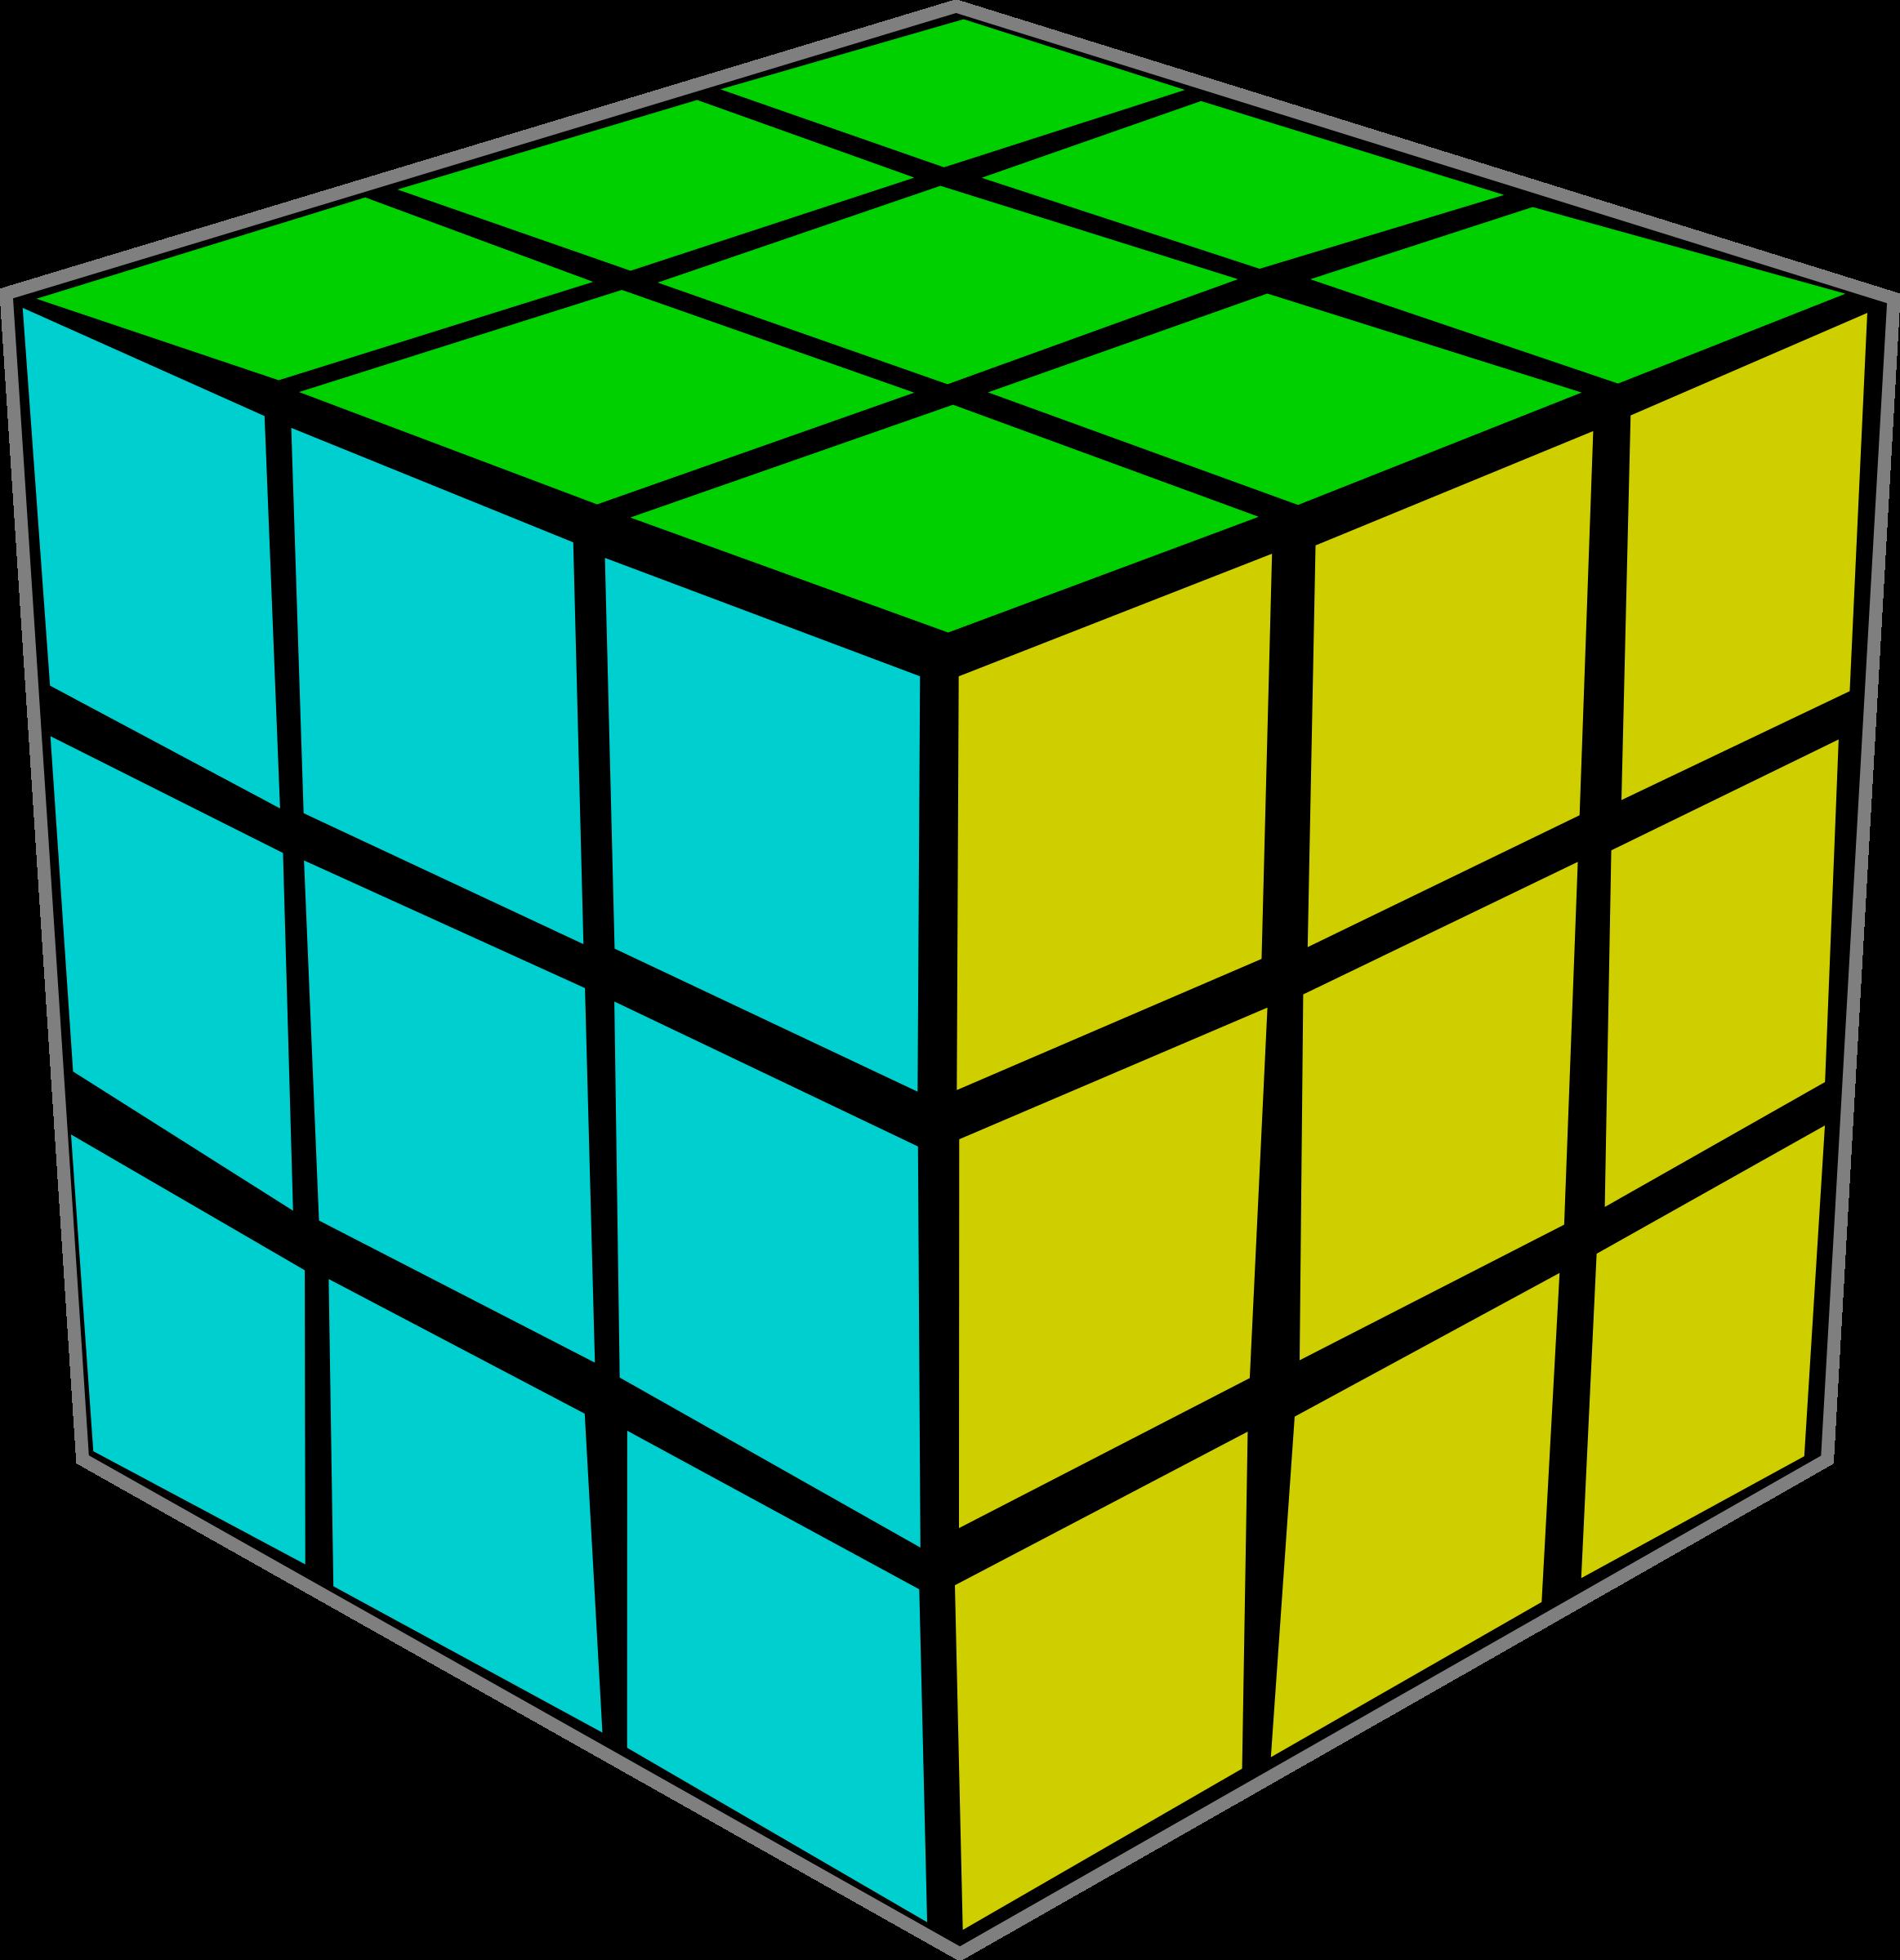 Rubik S Cube Rubiks Cube Cube Cube Image